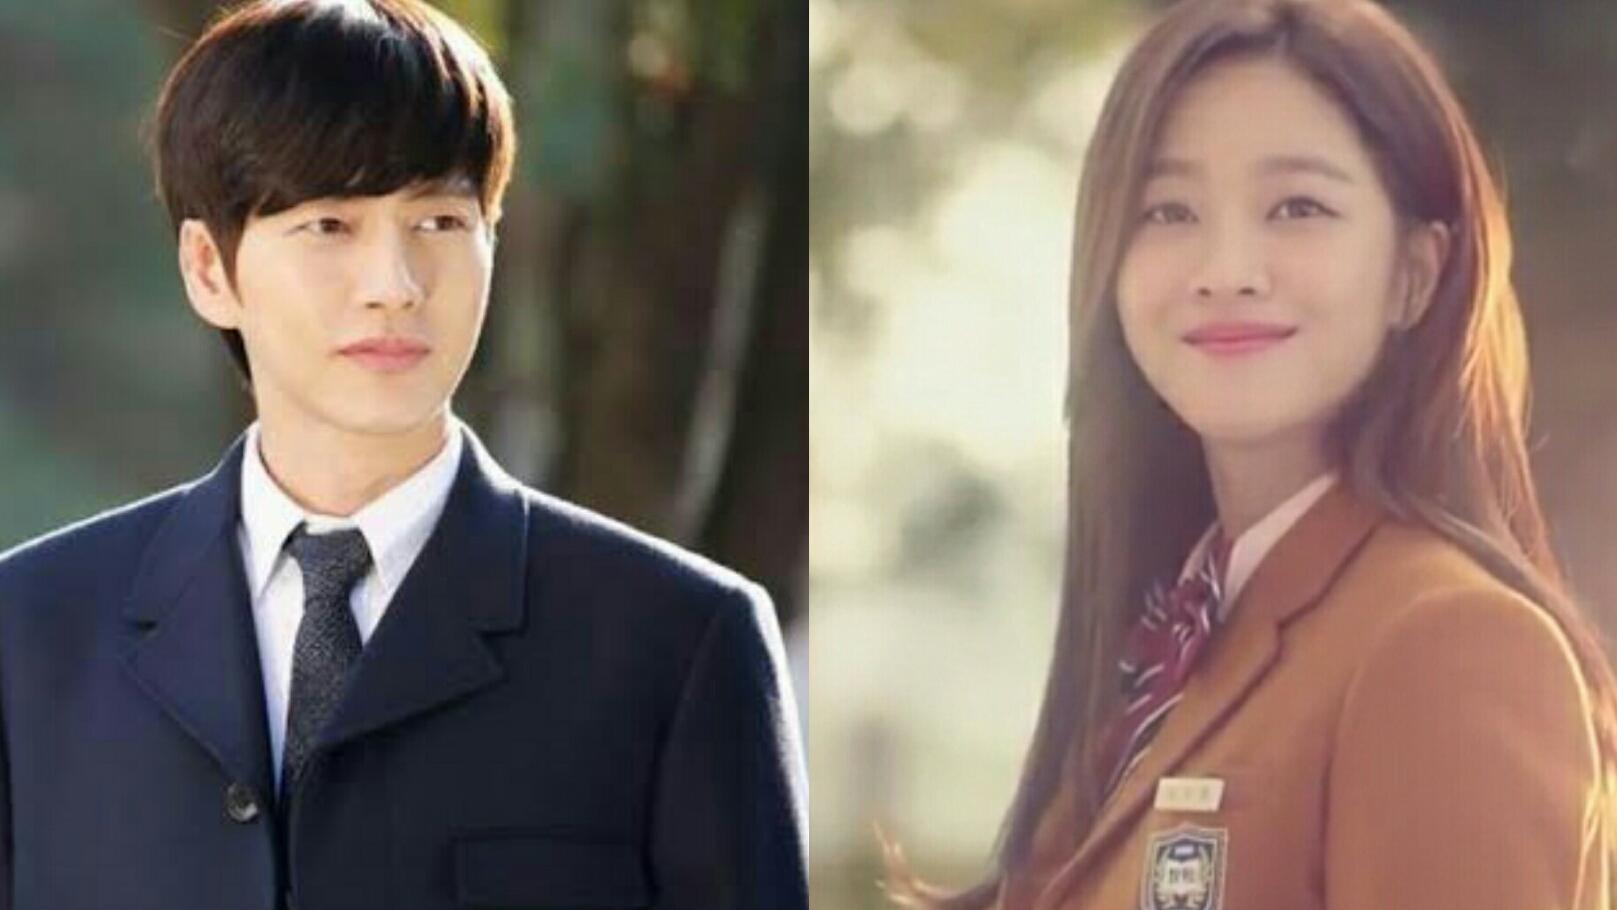 Park Hae Jin And Jo Bo Ah (my Strange Hero) Both Have - Park Hae Jin Drama , HD Wallpaper & Backgrounds